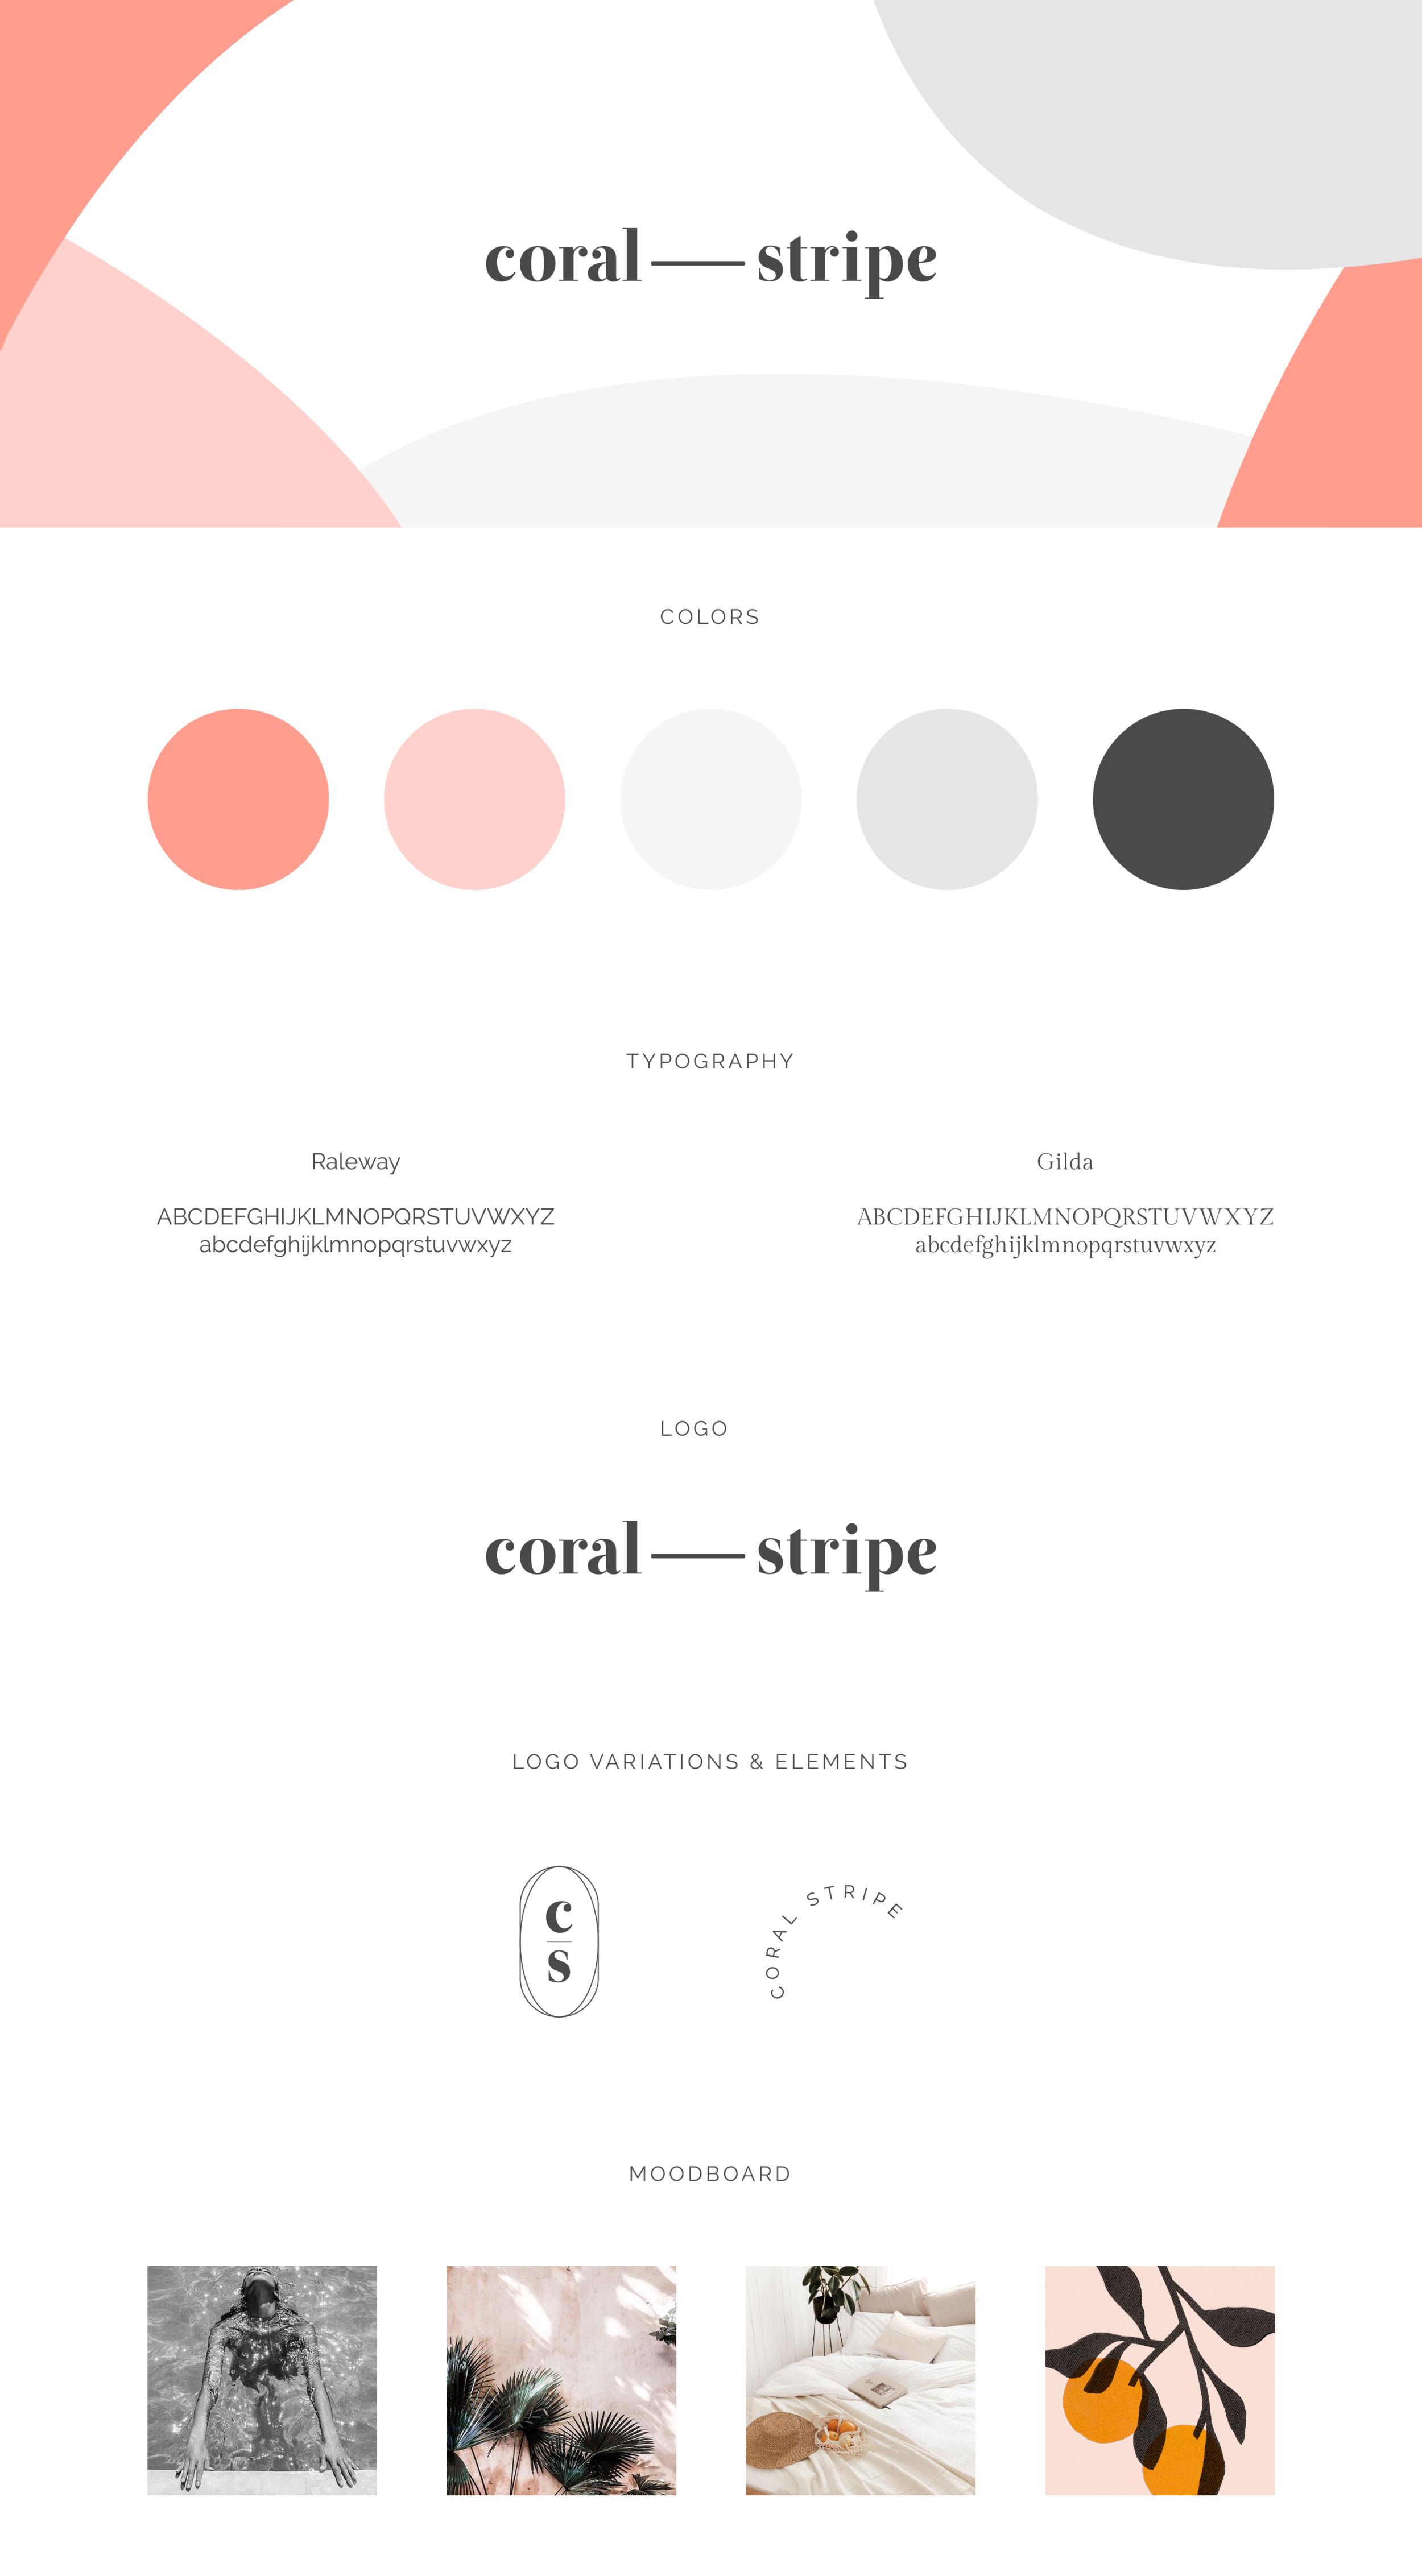 coral-stripe-brand-board-2Artboard 1@2x.png